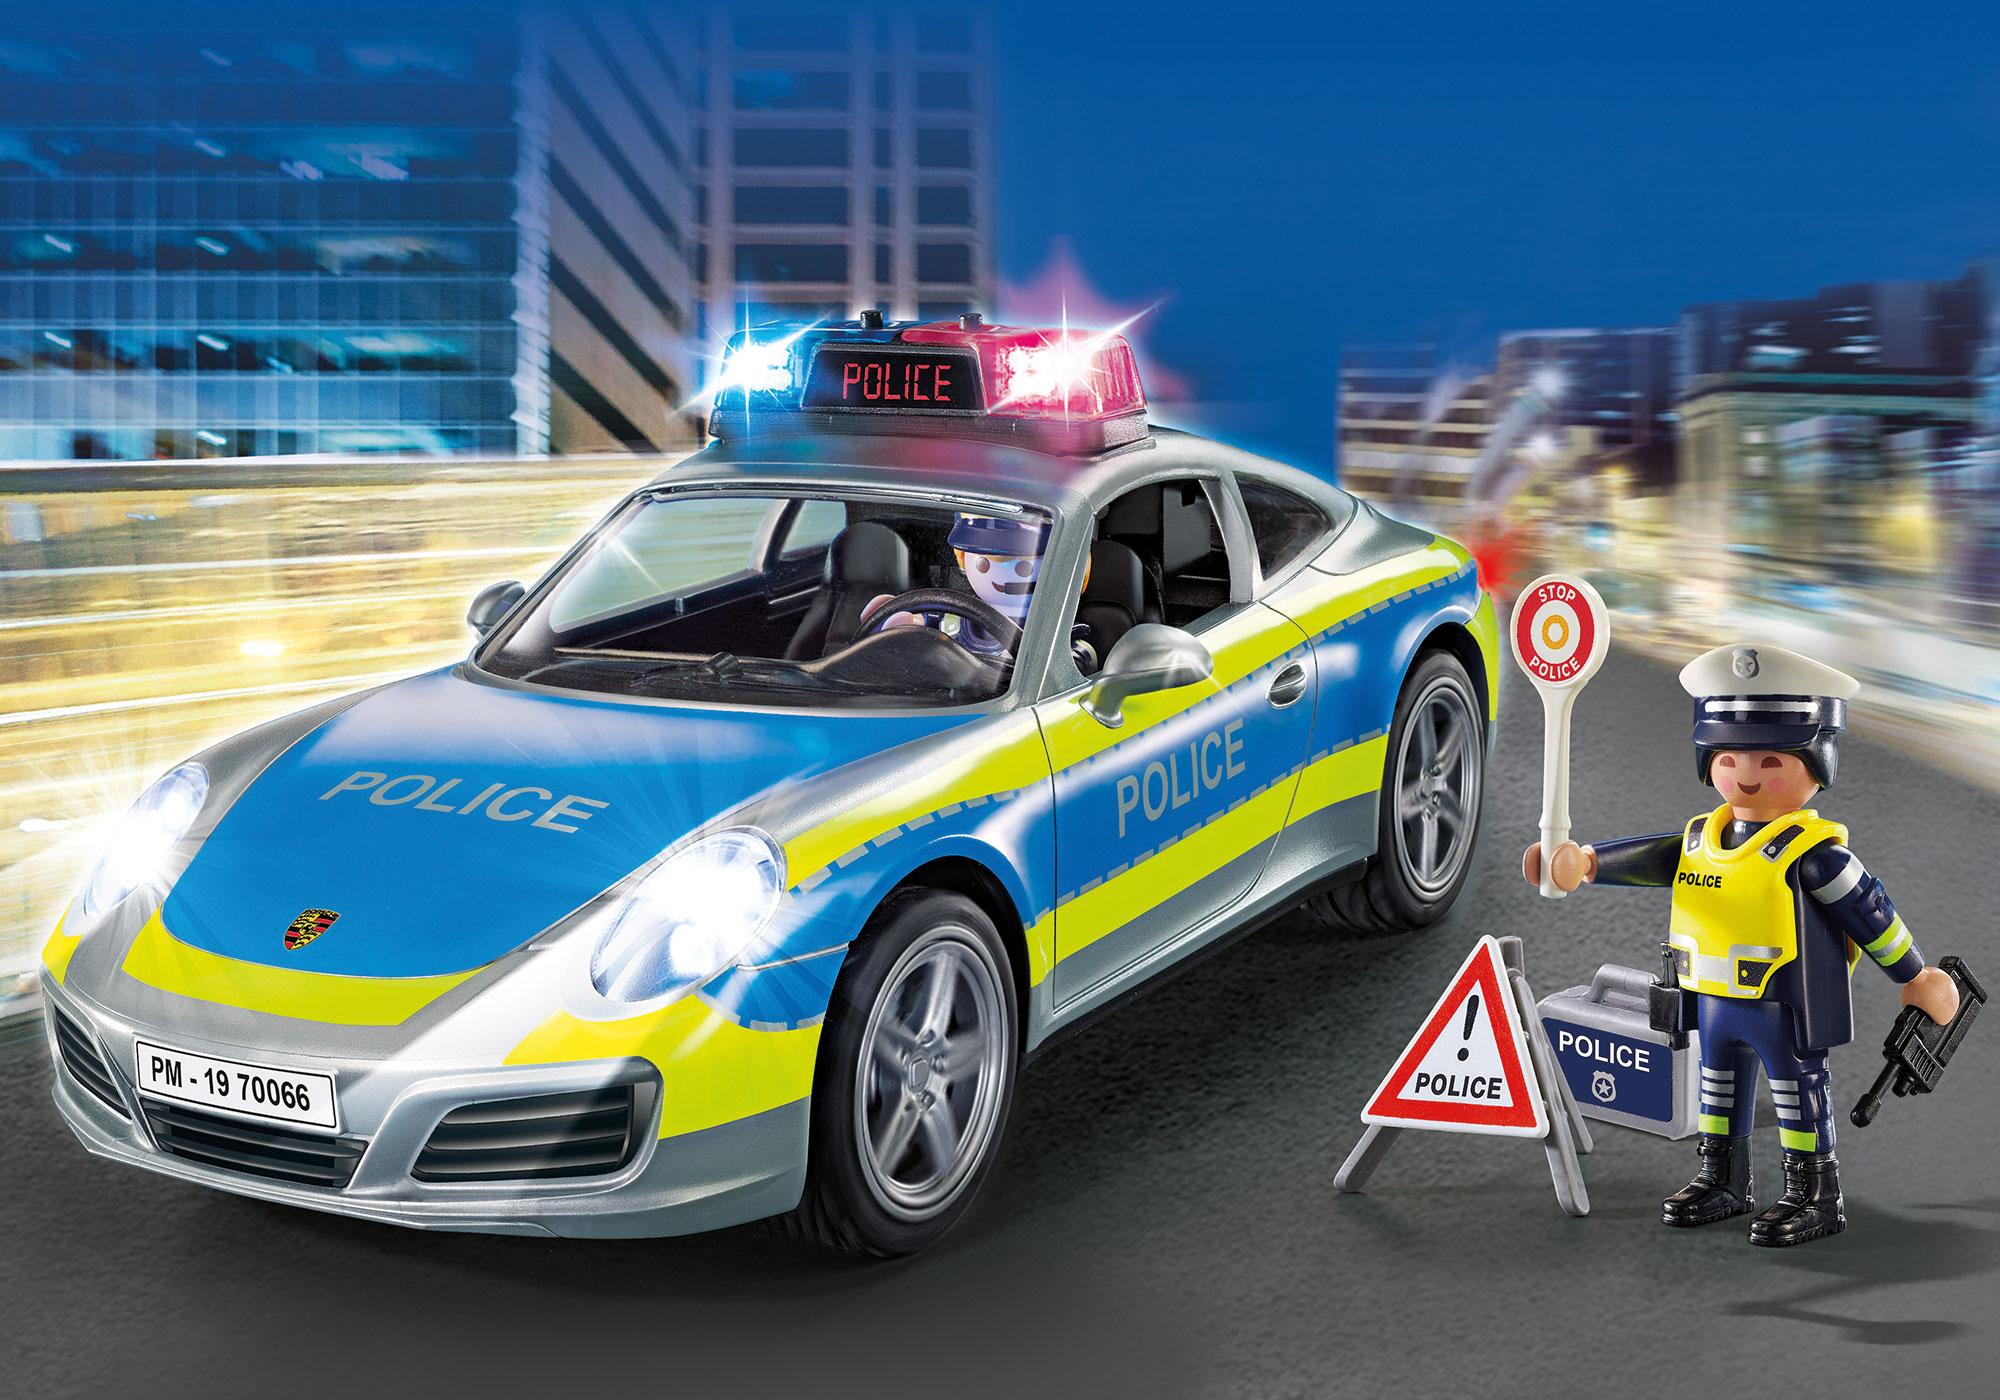 http://media.playmobil.com/i/playmobil/70066_product_detail/Porsche 911 Carrera 4S Politie